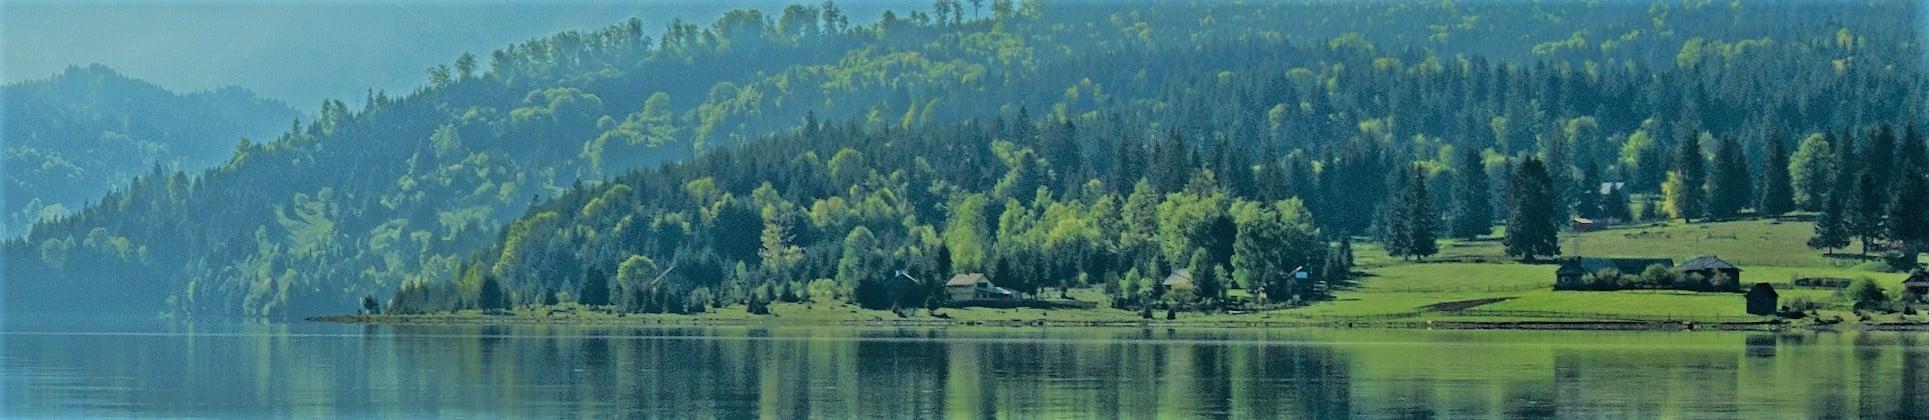 Lake Image_Penne Profile Cover.jpeg